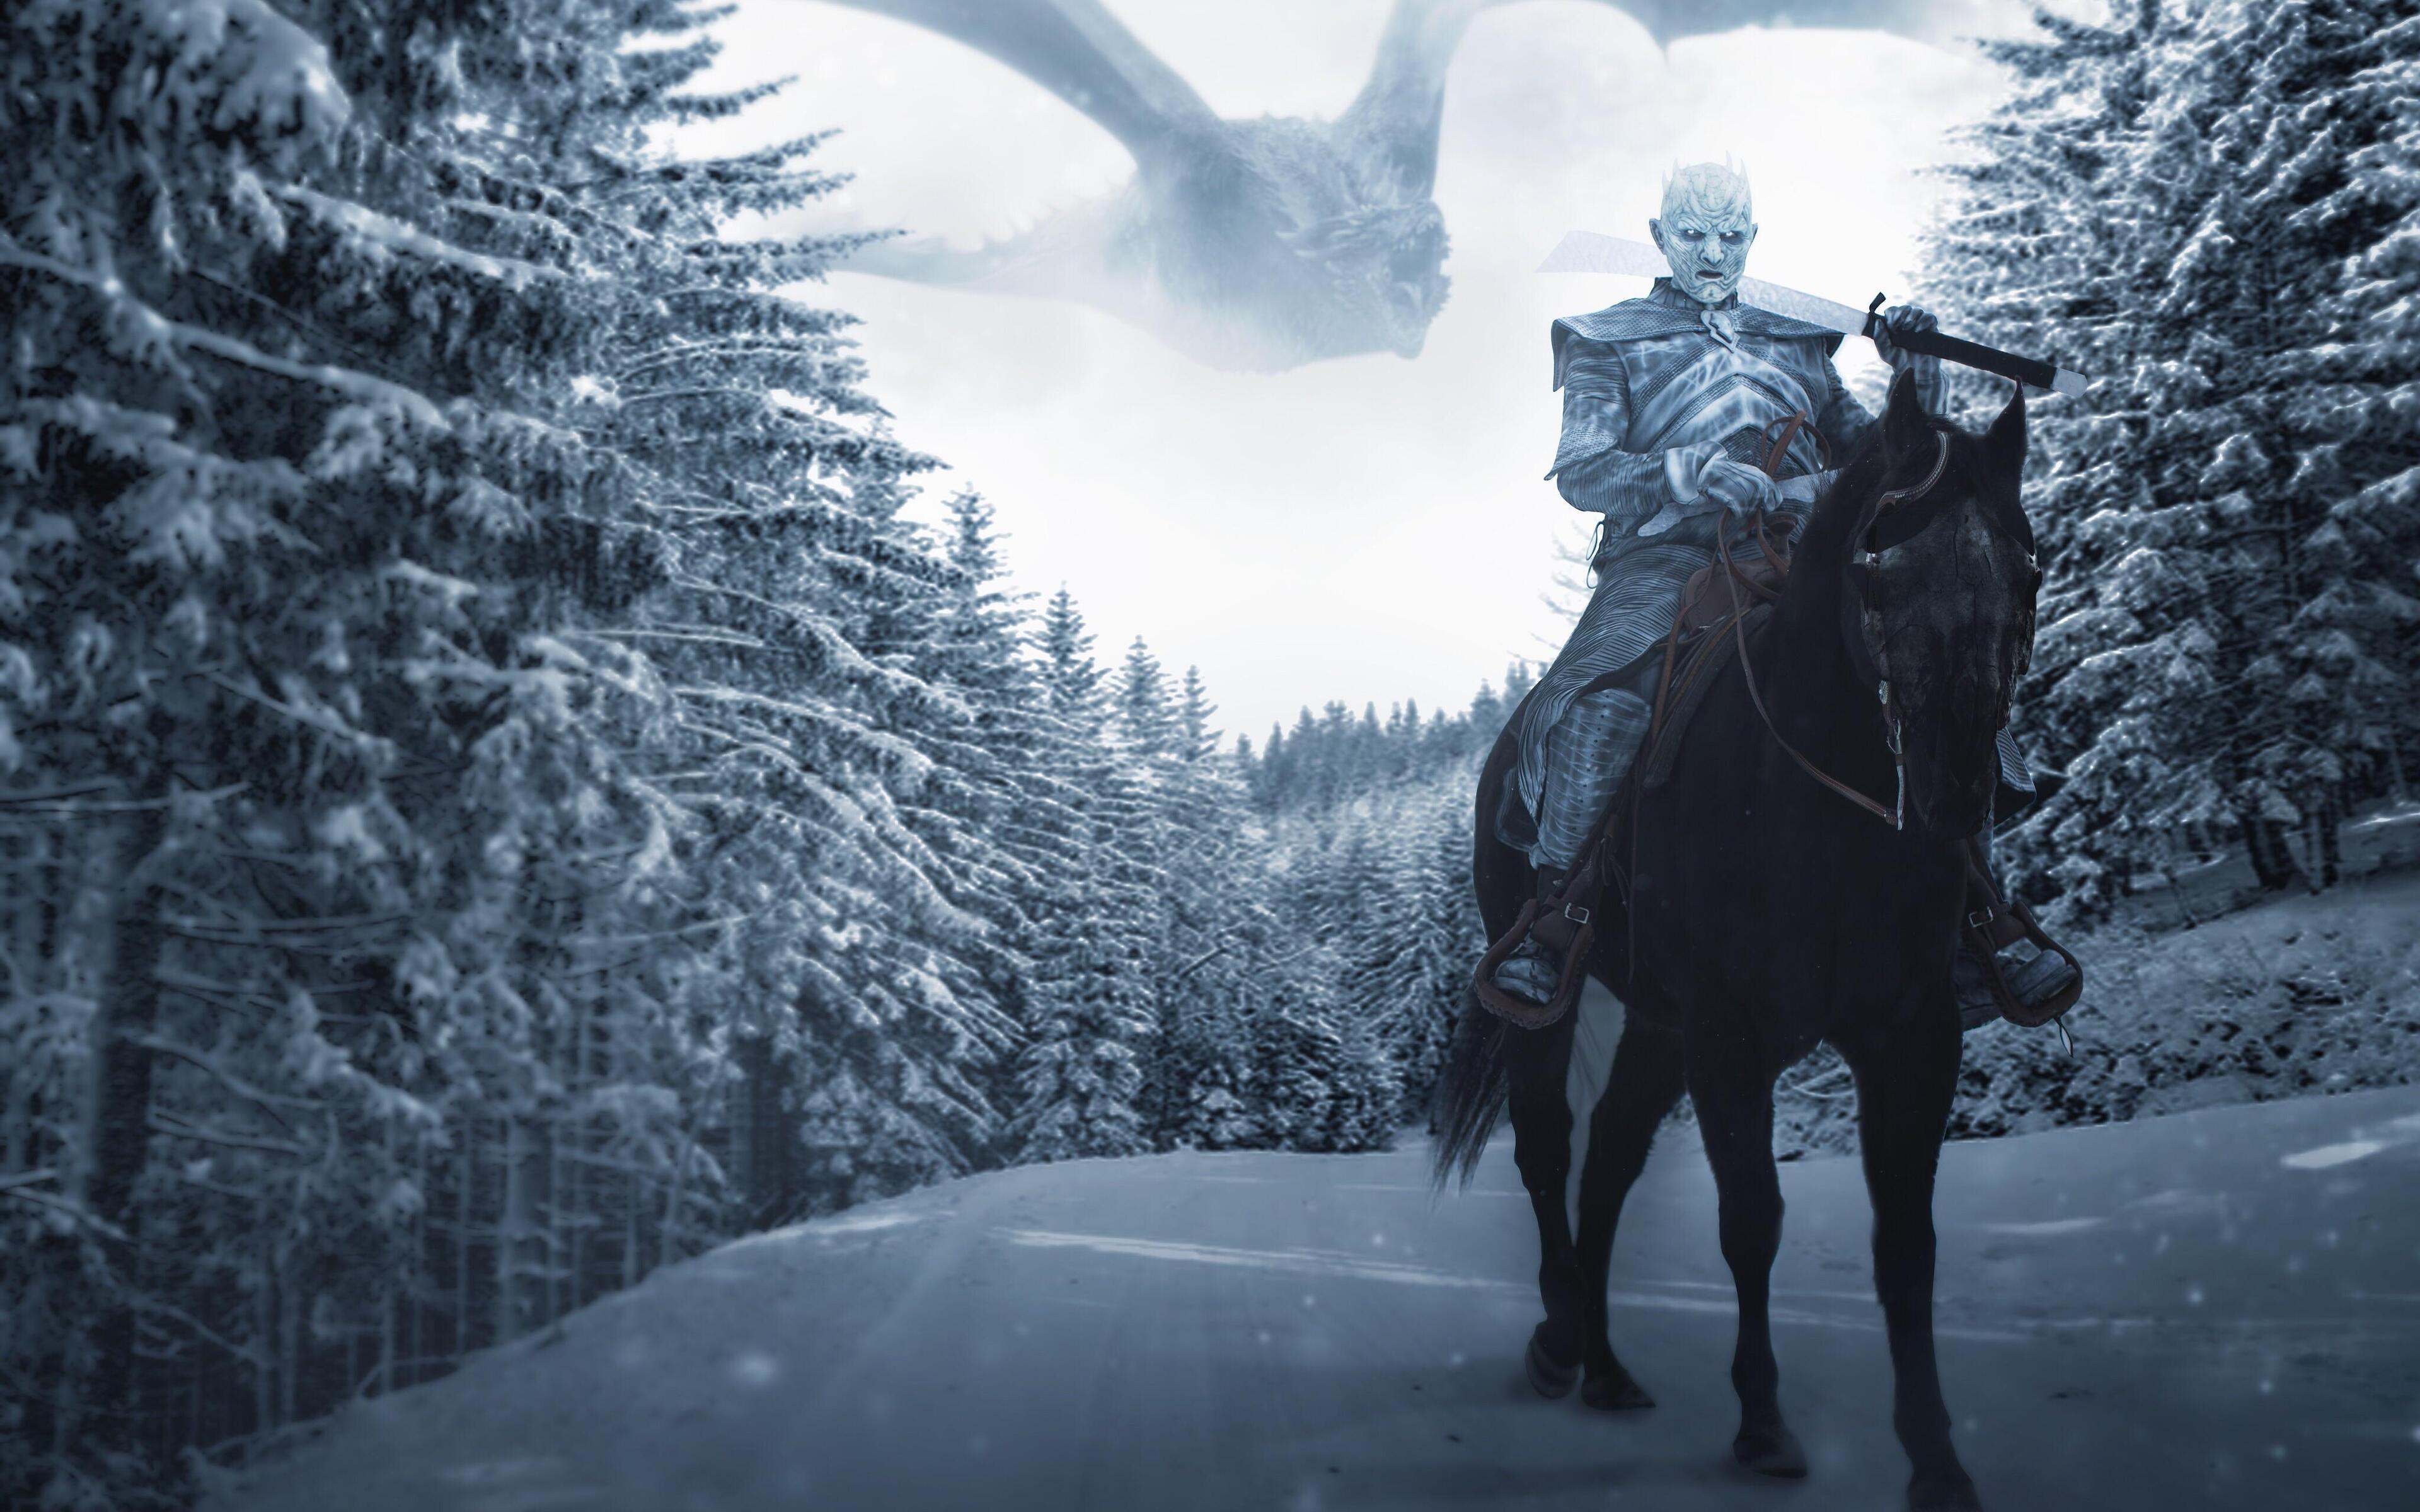 night-king-game-of-thrones-season-8-v7.jpg